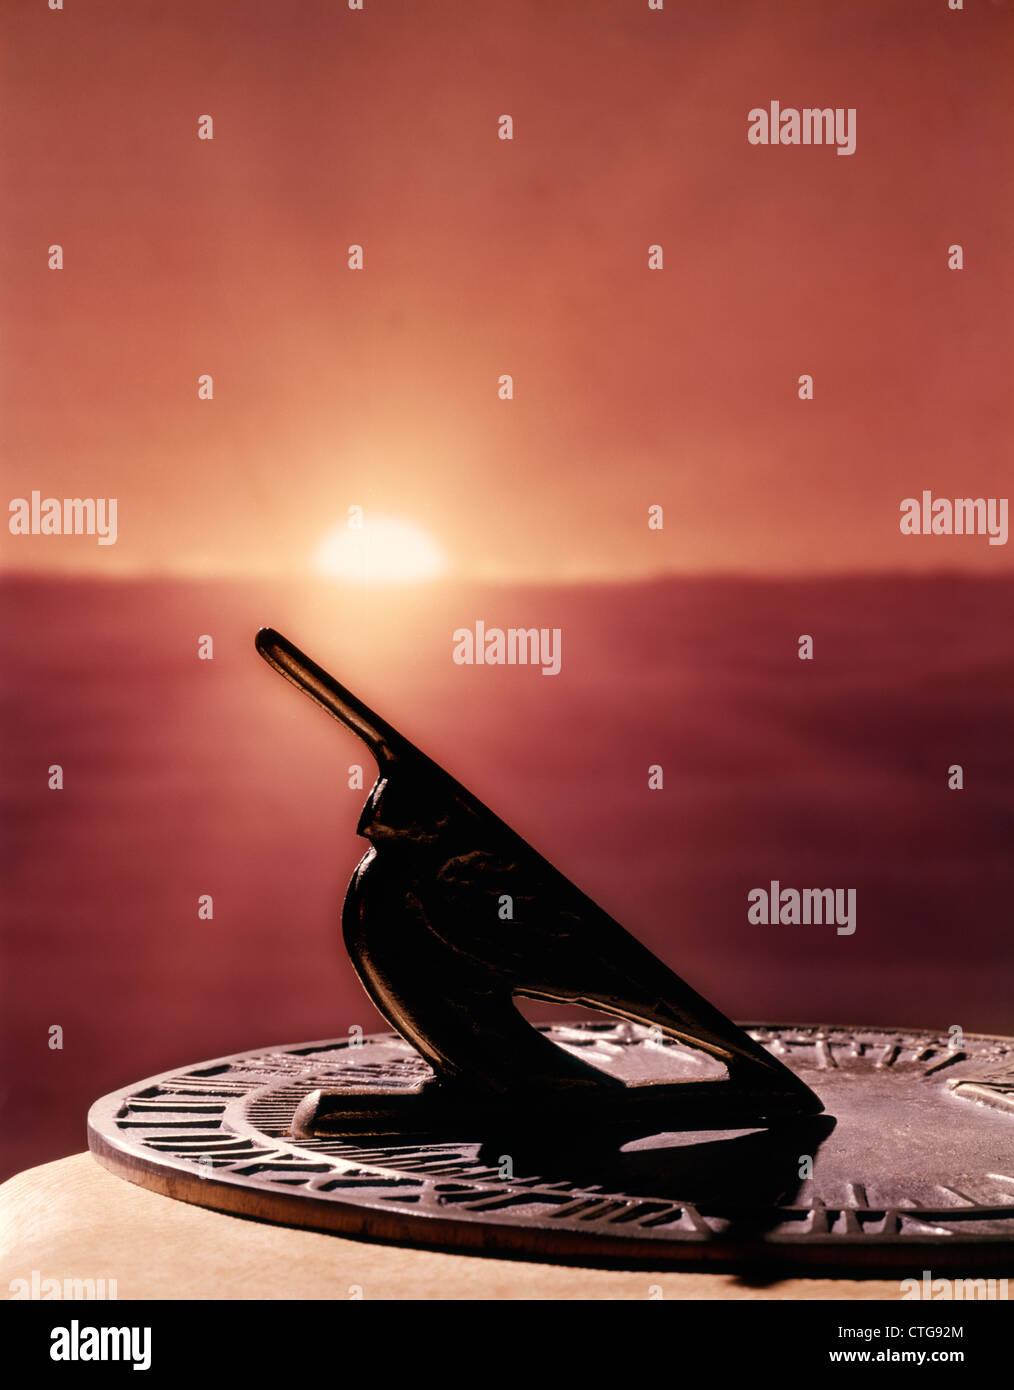 SETTING SUN CASTING A SHADOW ON SUNDIAL - Stock Image